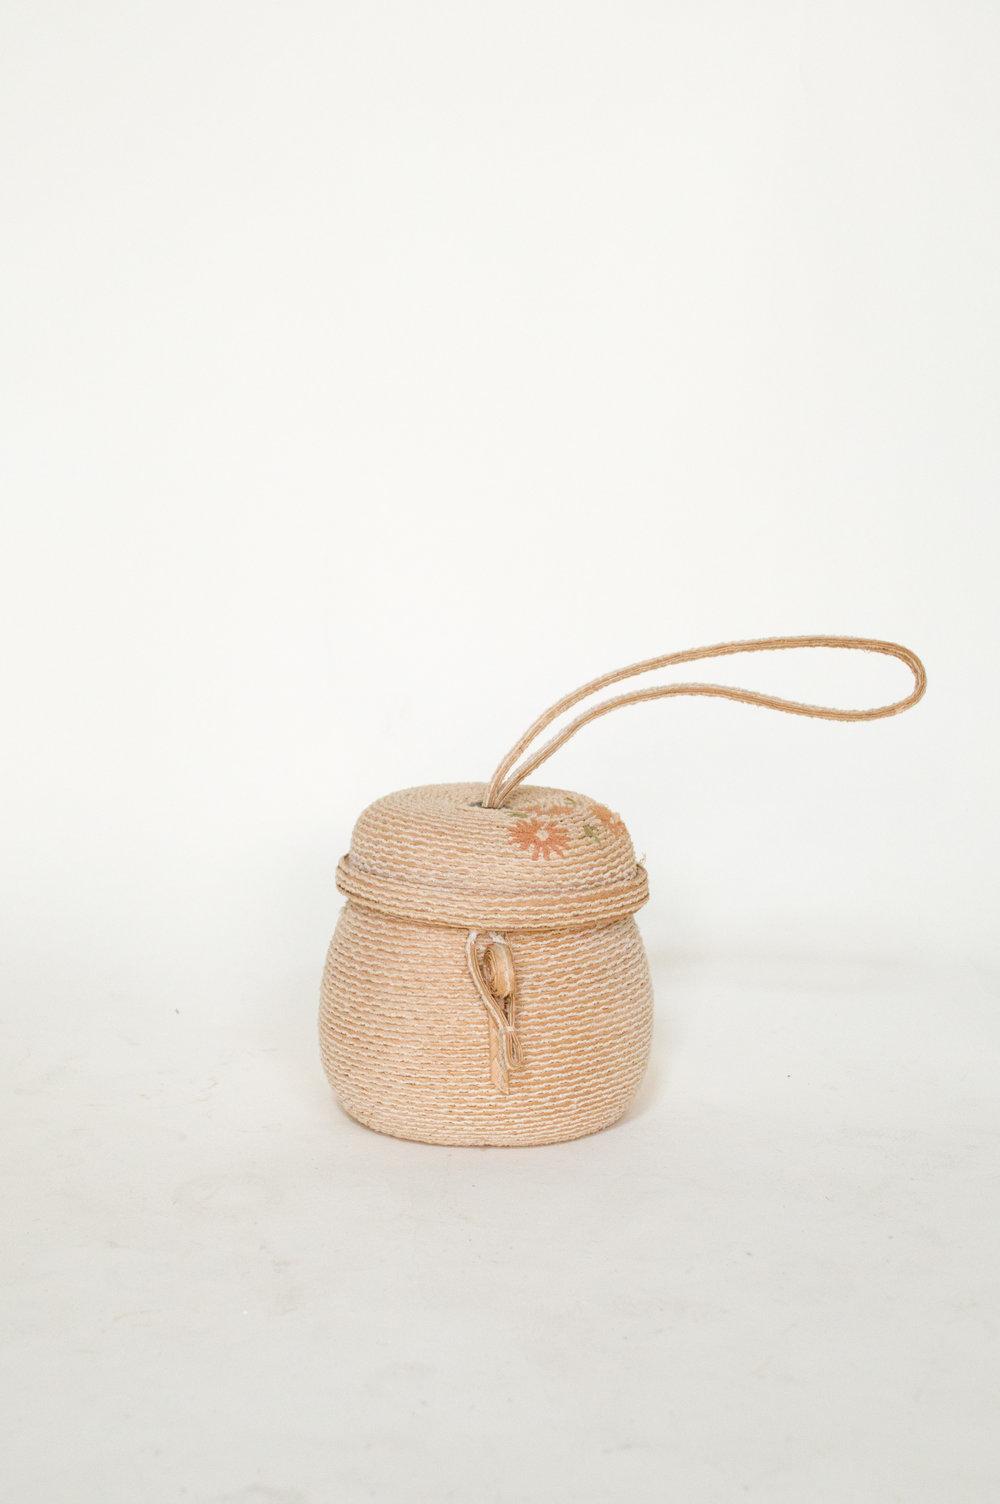 Vintage straw handbag from Dalena Vintage